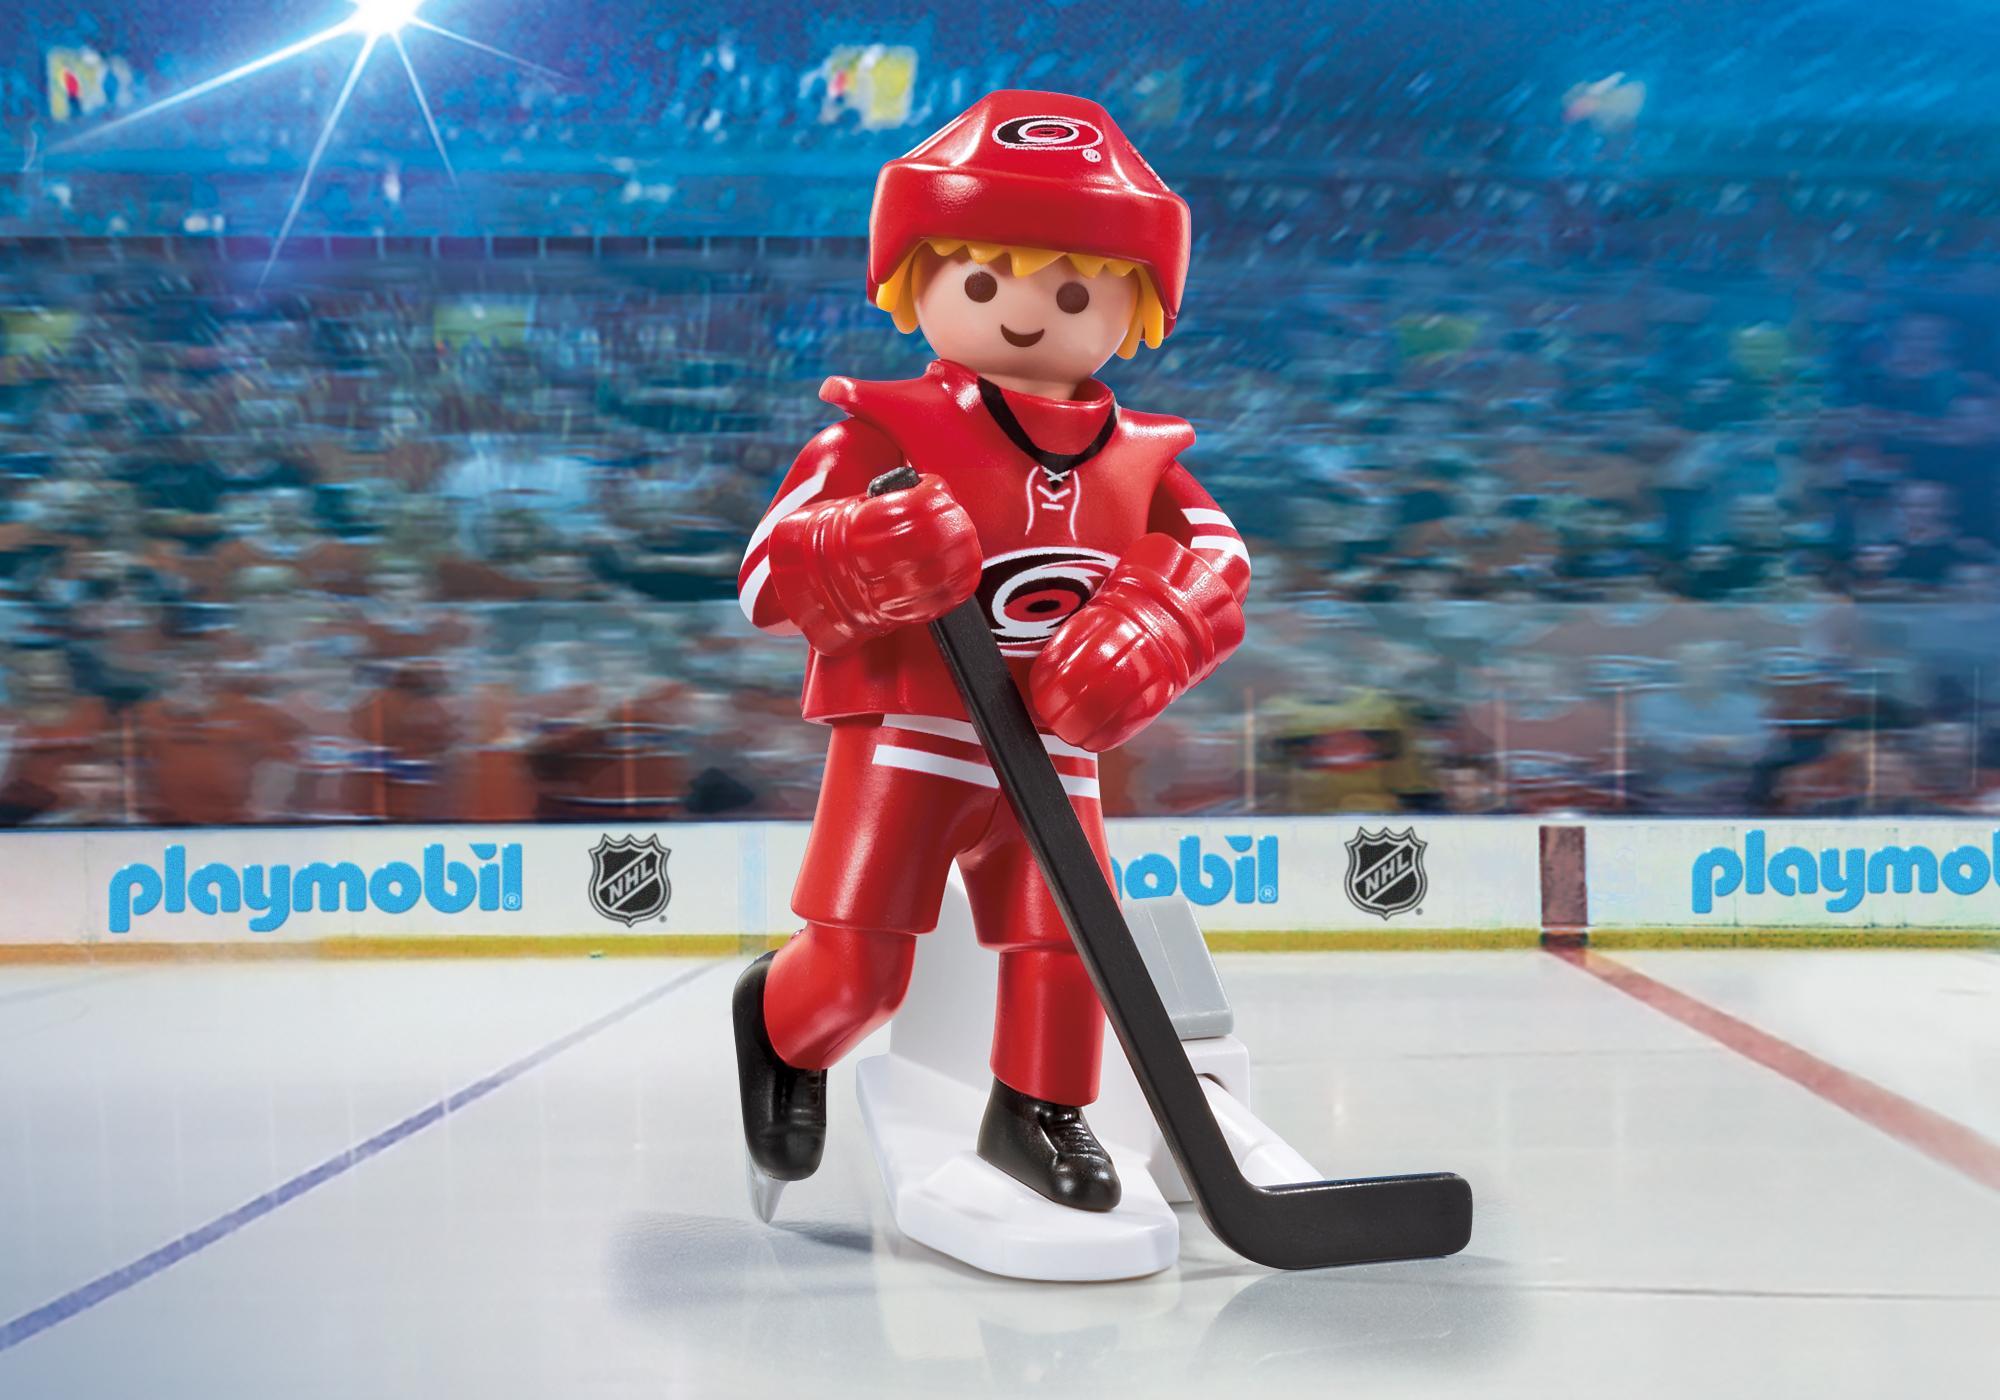 http://media.playmobil.com/i/playmobil/9200_product_detail/NHL™ Carolina Hurricanes™ Player